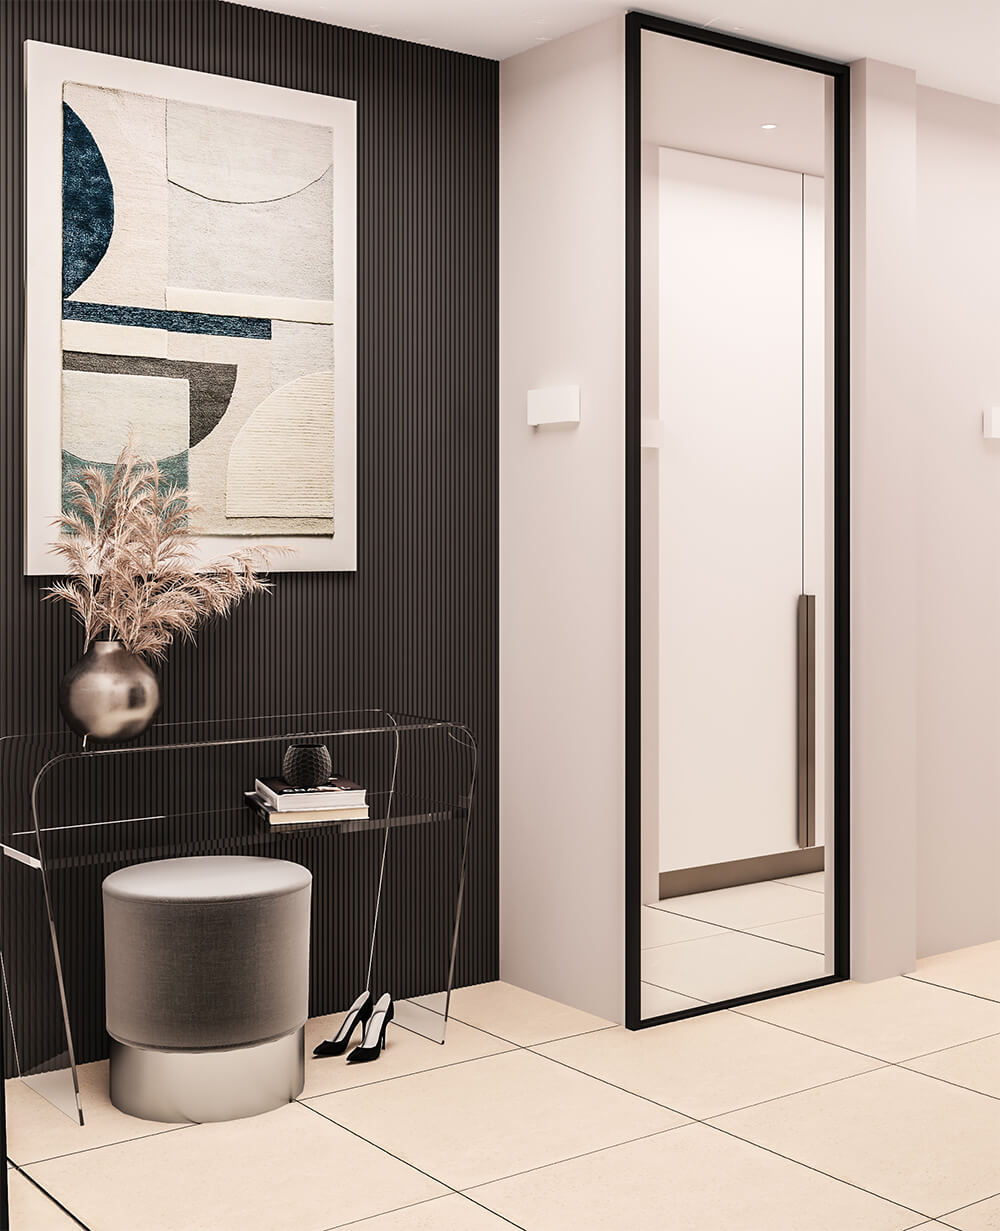 interioren-dizain-proekt-na-koridor-antre-proekt-blu